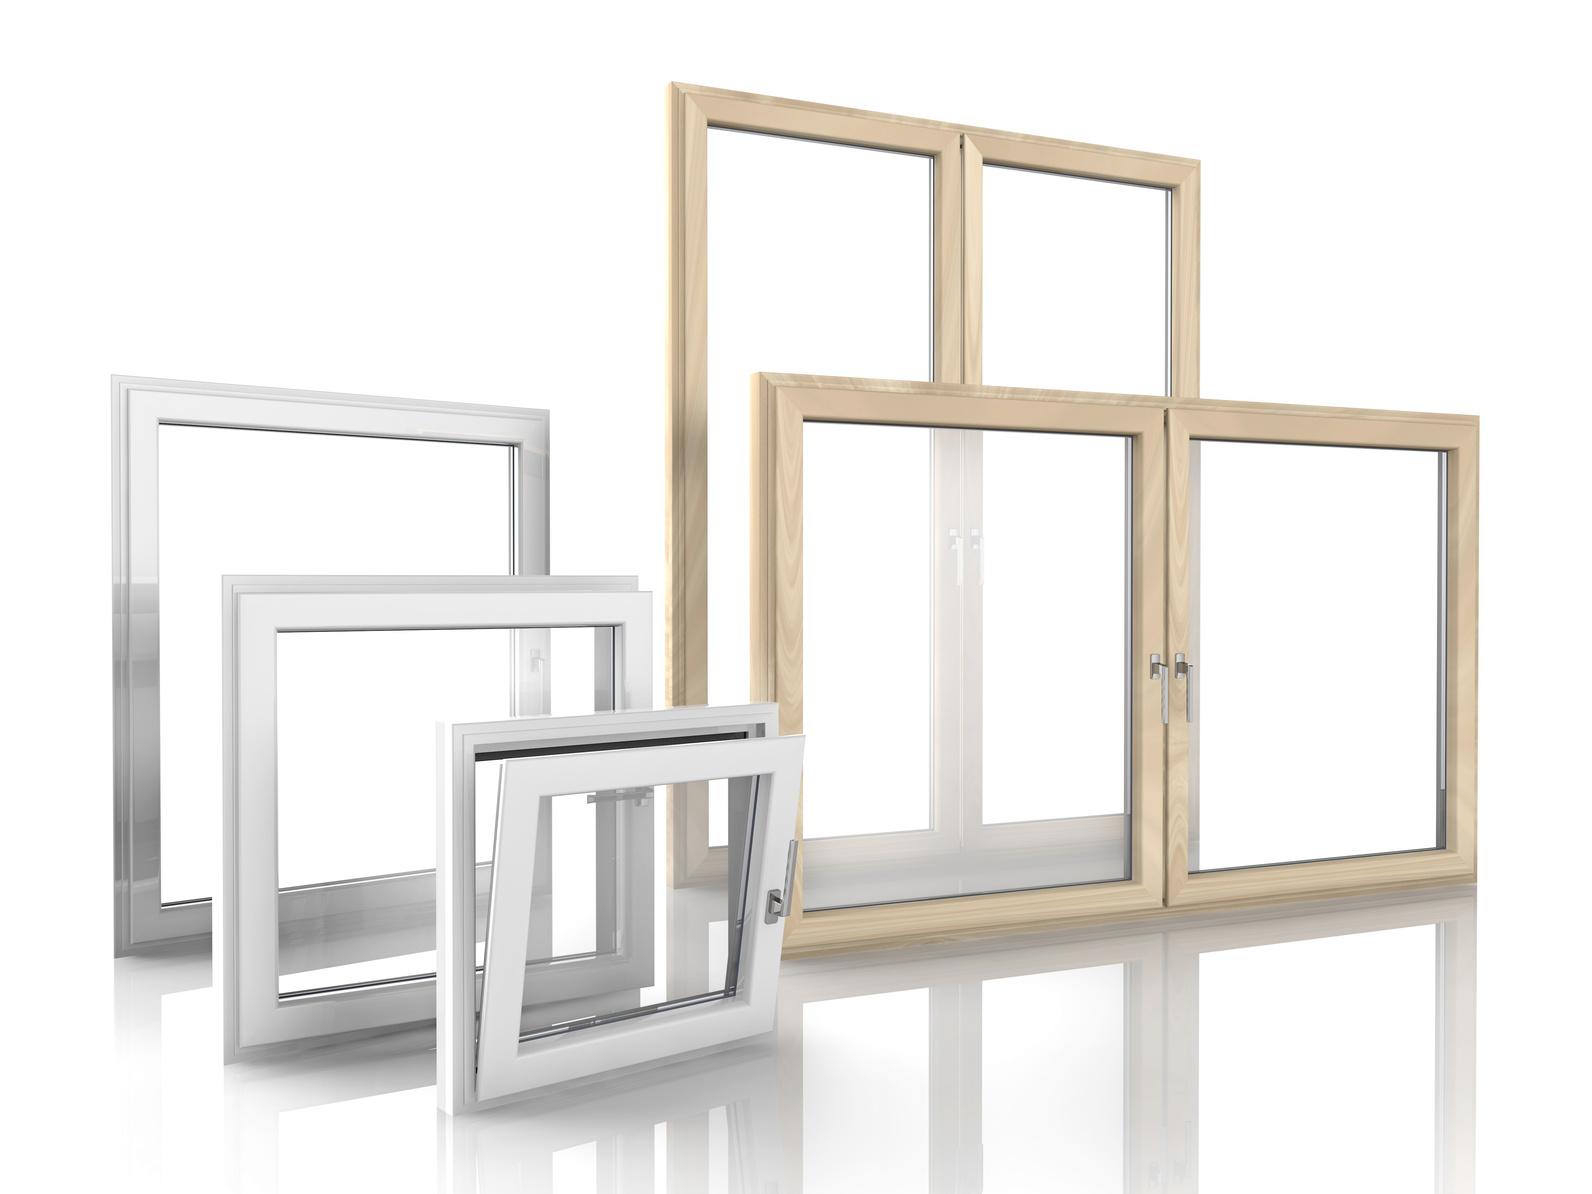 vitrerie miroiterie grenoble 38 la vitrerie de l 39 ile verte. Black Bedroom Furniture Sets. Home Design Ideas